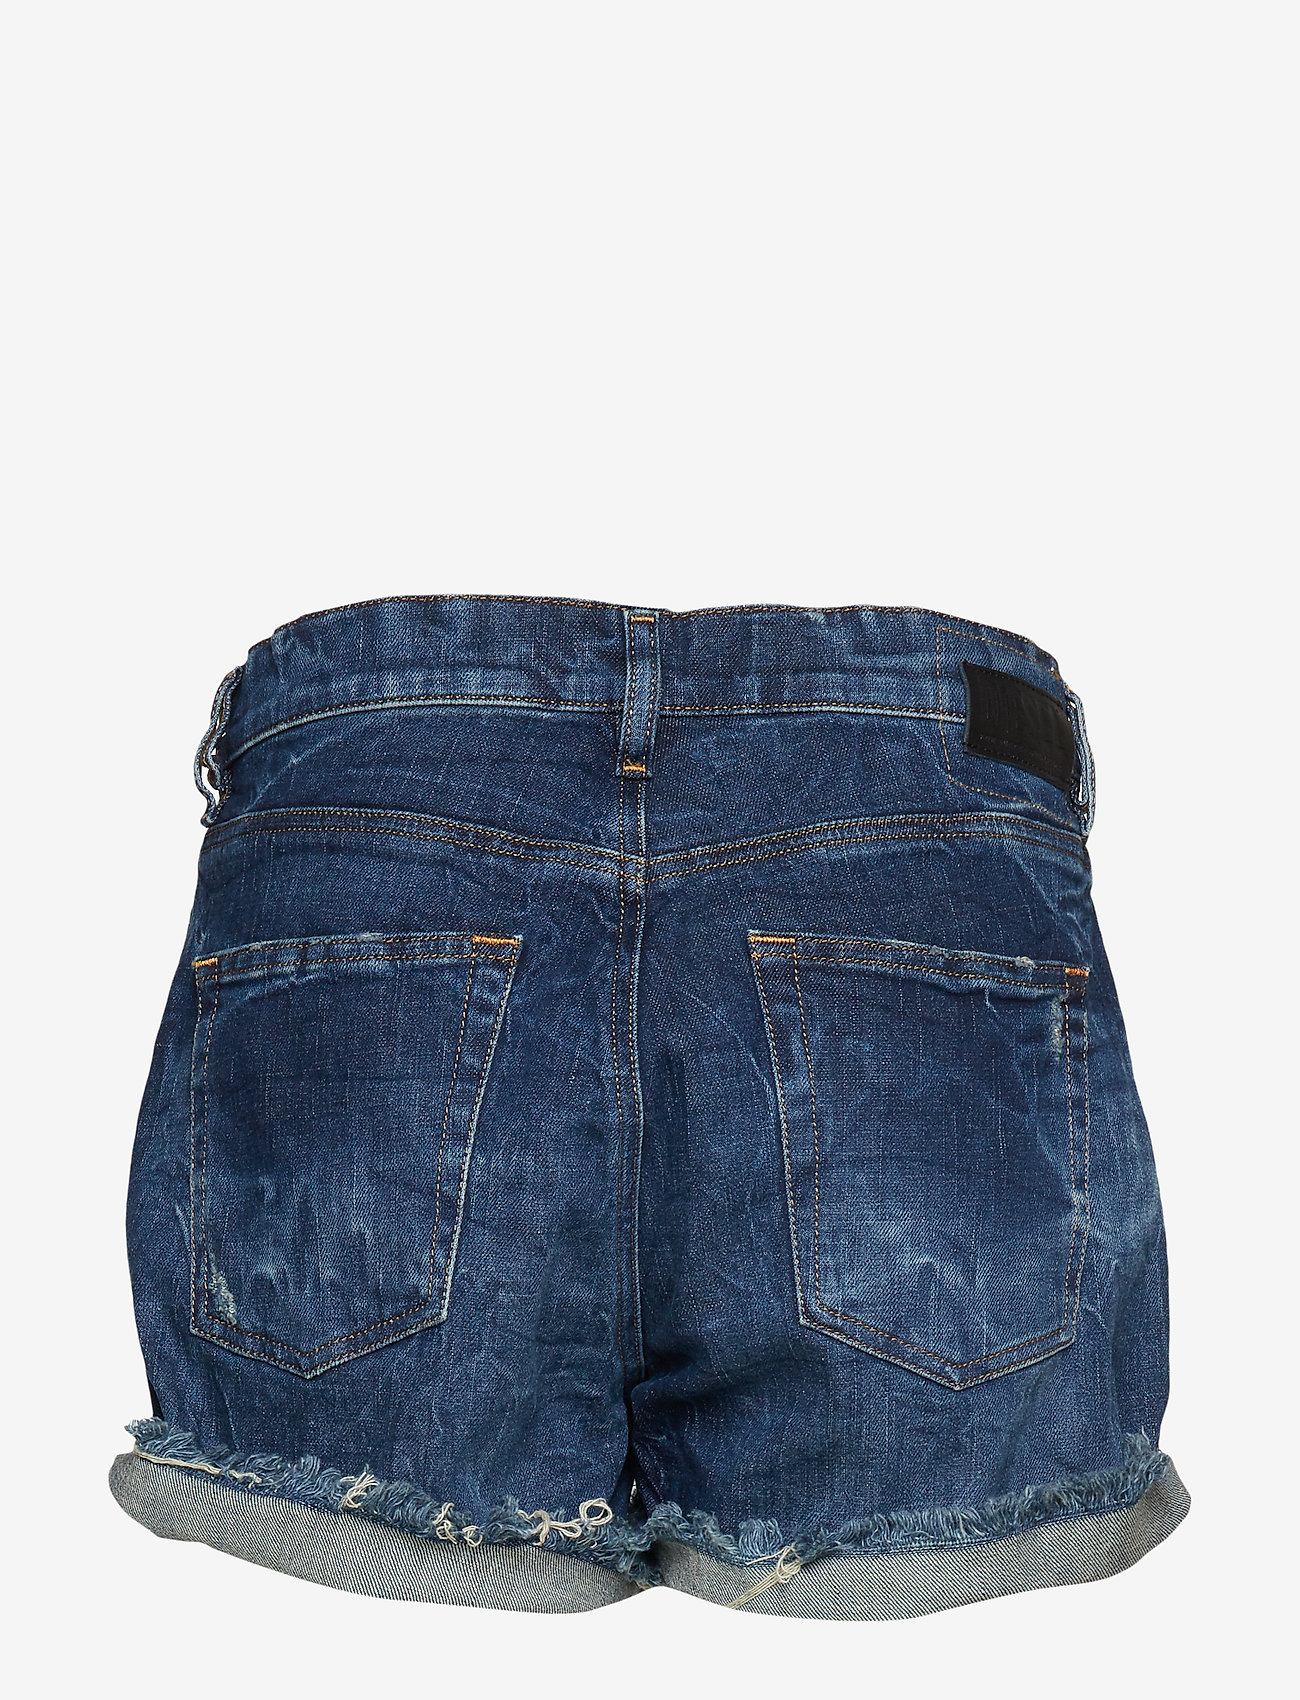 Diesel Women - DE-LOWY SHORTS - denim shorts - denim - 1